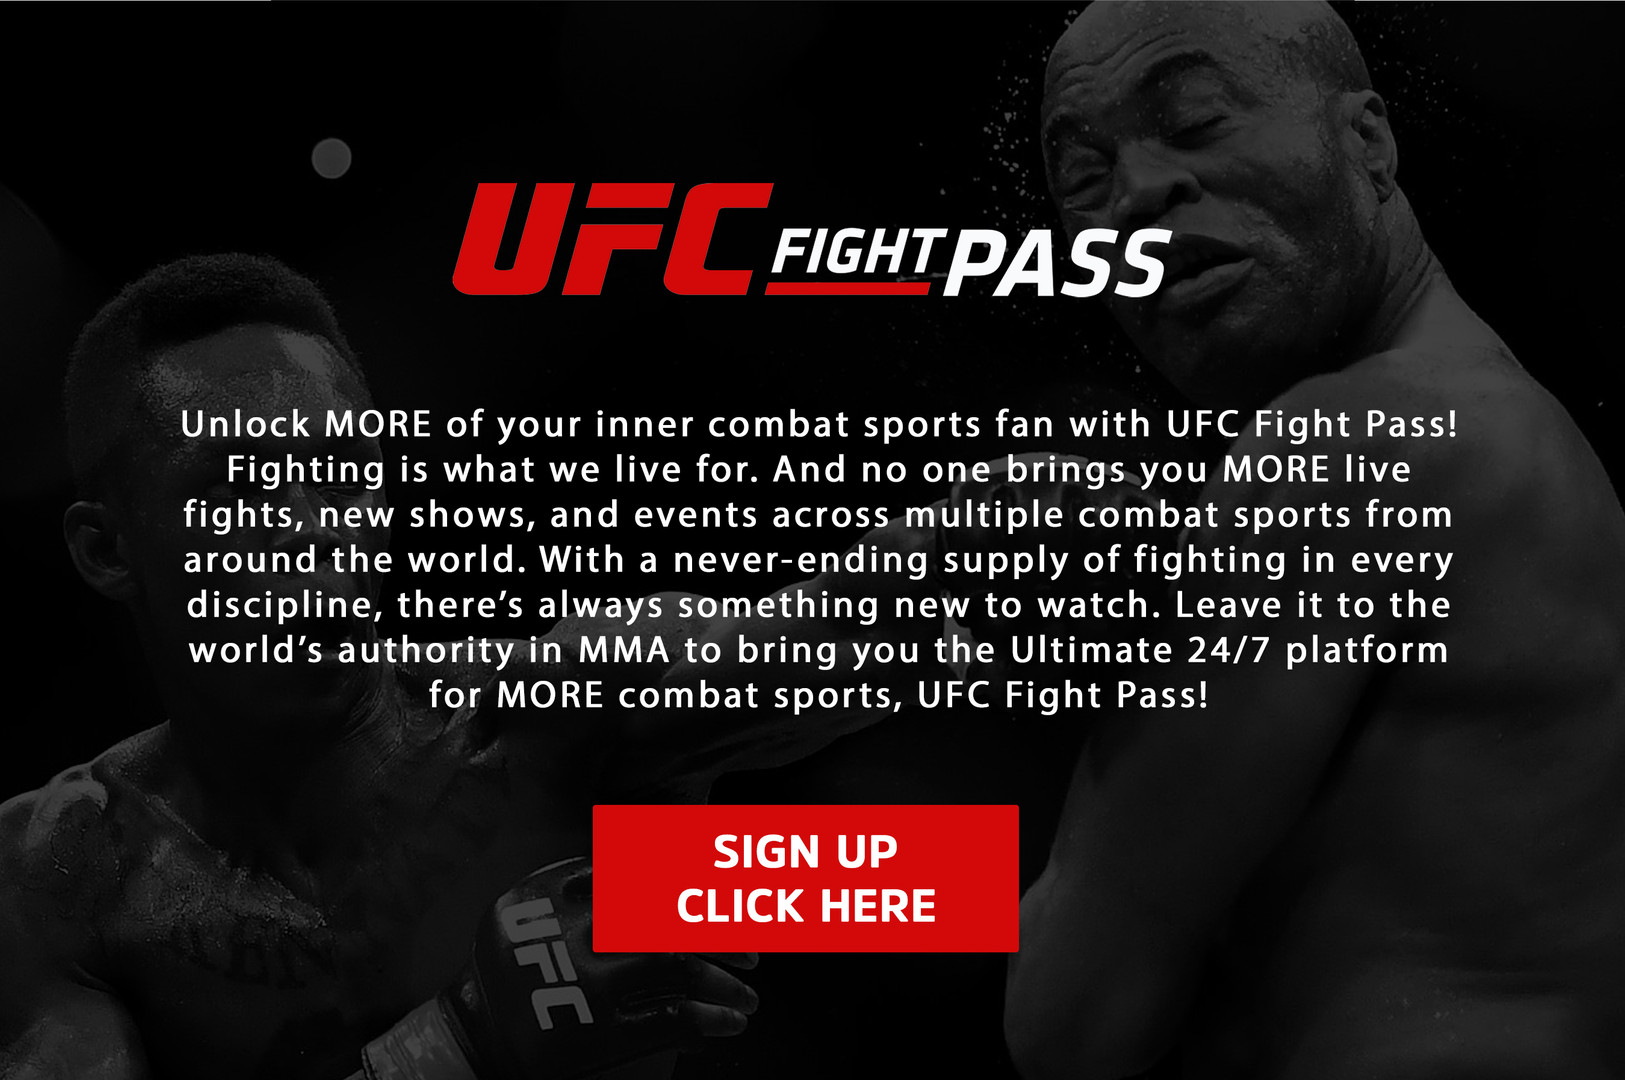 ufc fight pass - site.jpg